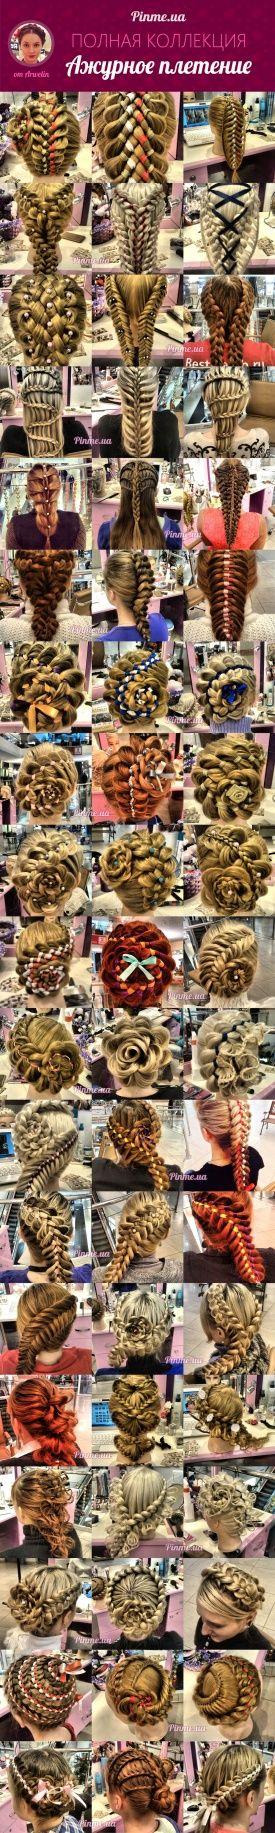 Openwork weaving braid ideas → 50 + lessons// Ажурное плетение кос → более 50 идей + уроки